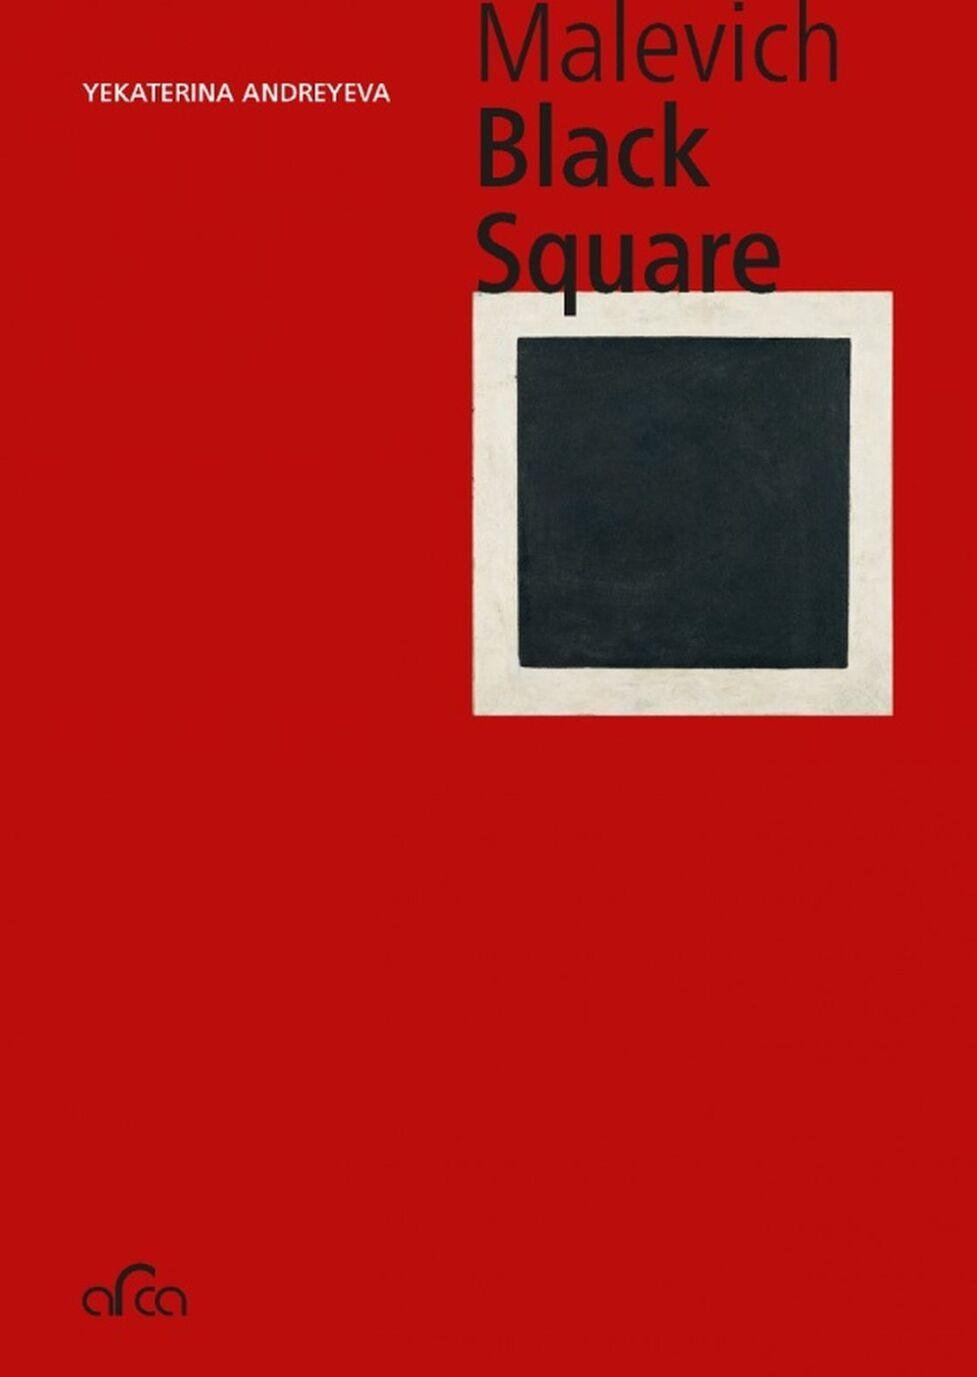 Kazimir Malevich. The Black Square